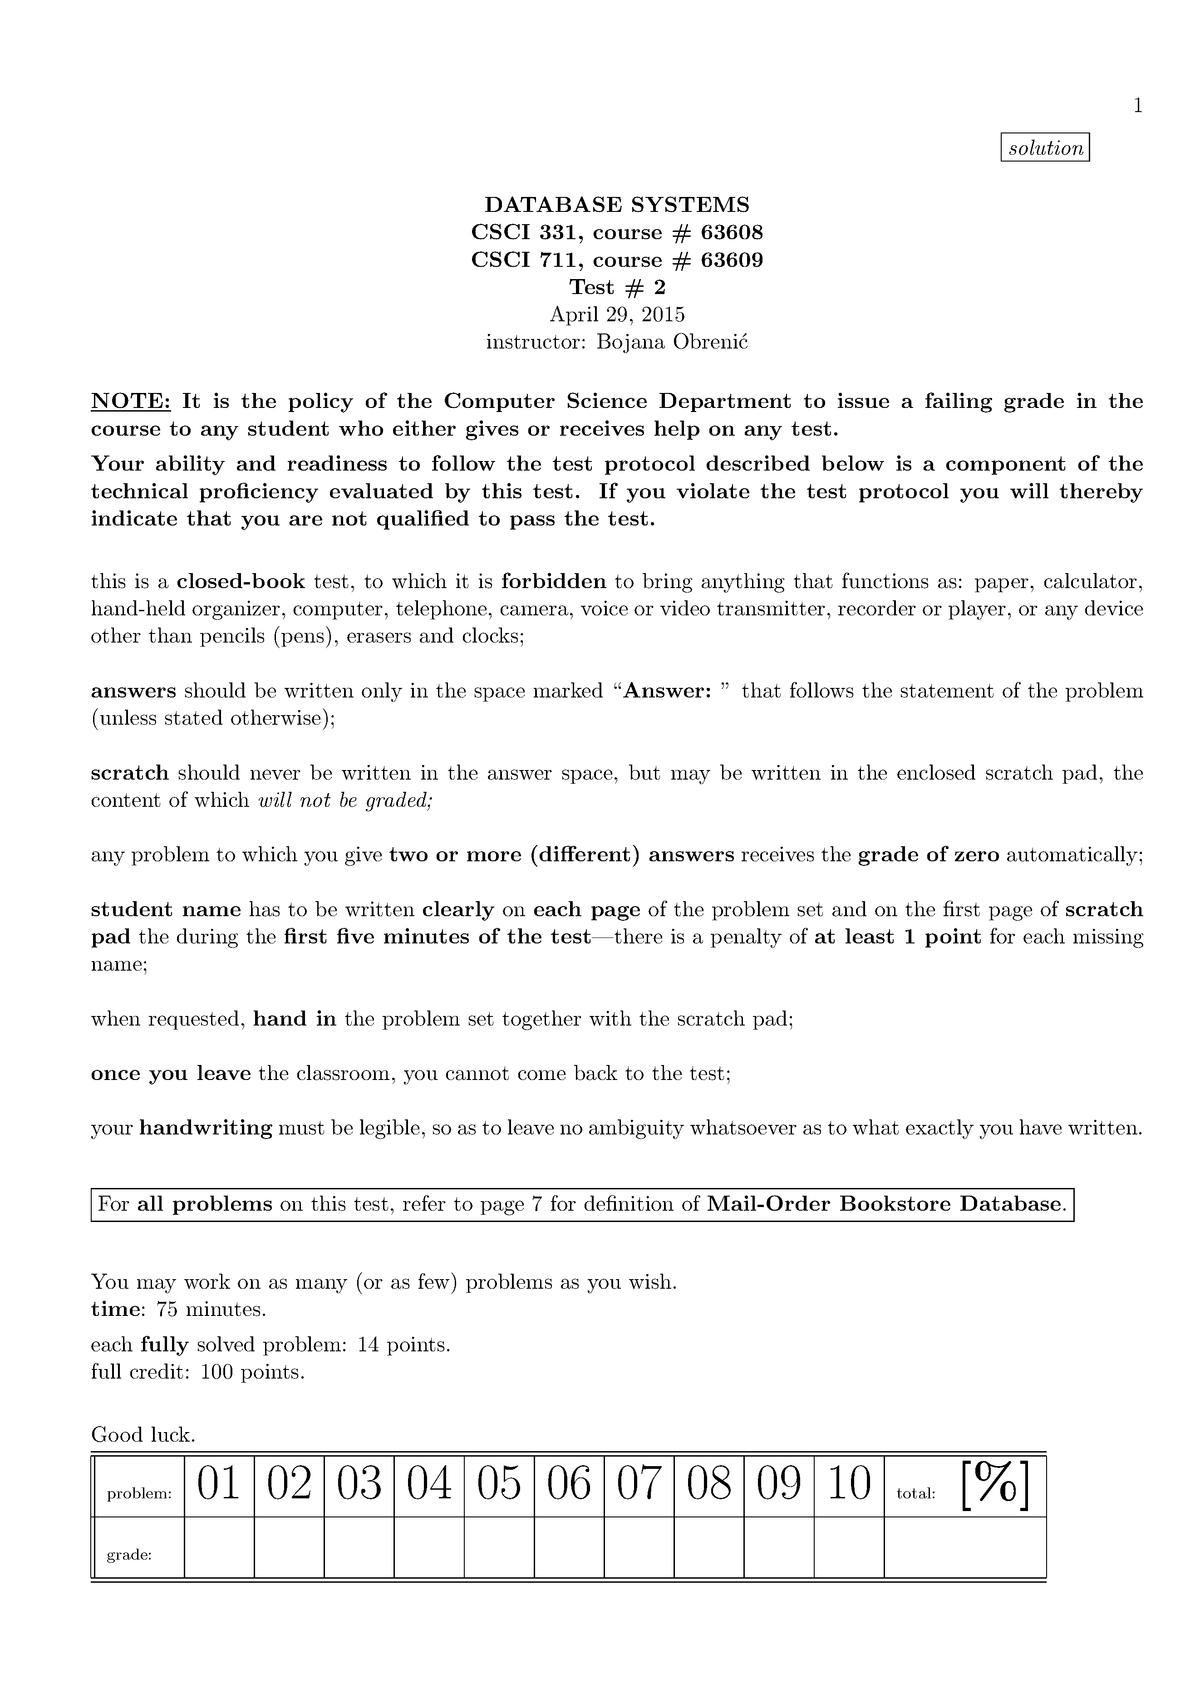 Exam 2017 - CSCI 331: Database Systems - StuDocu